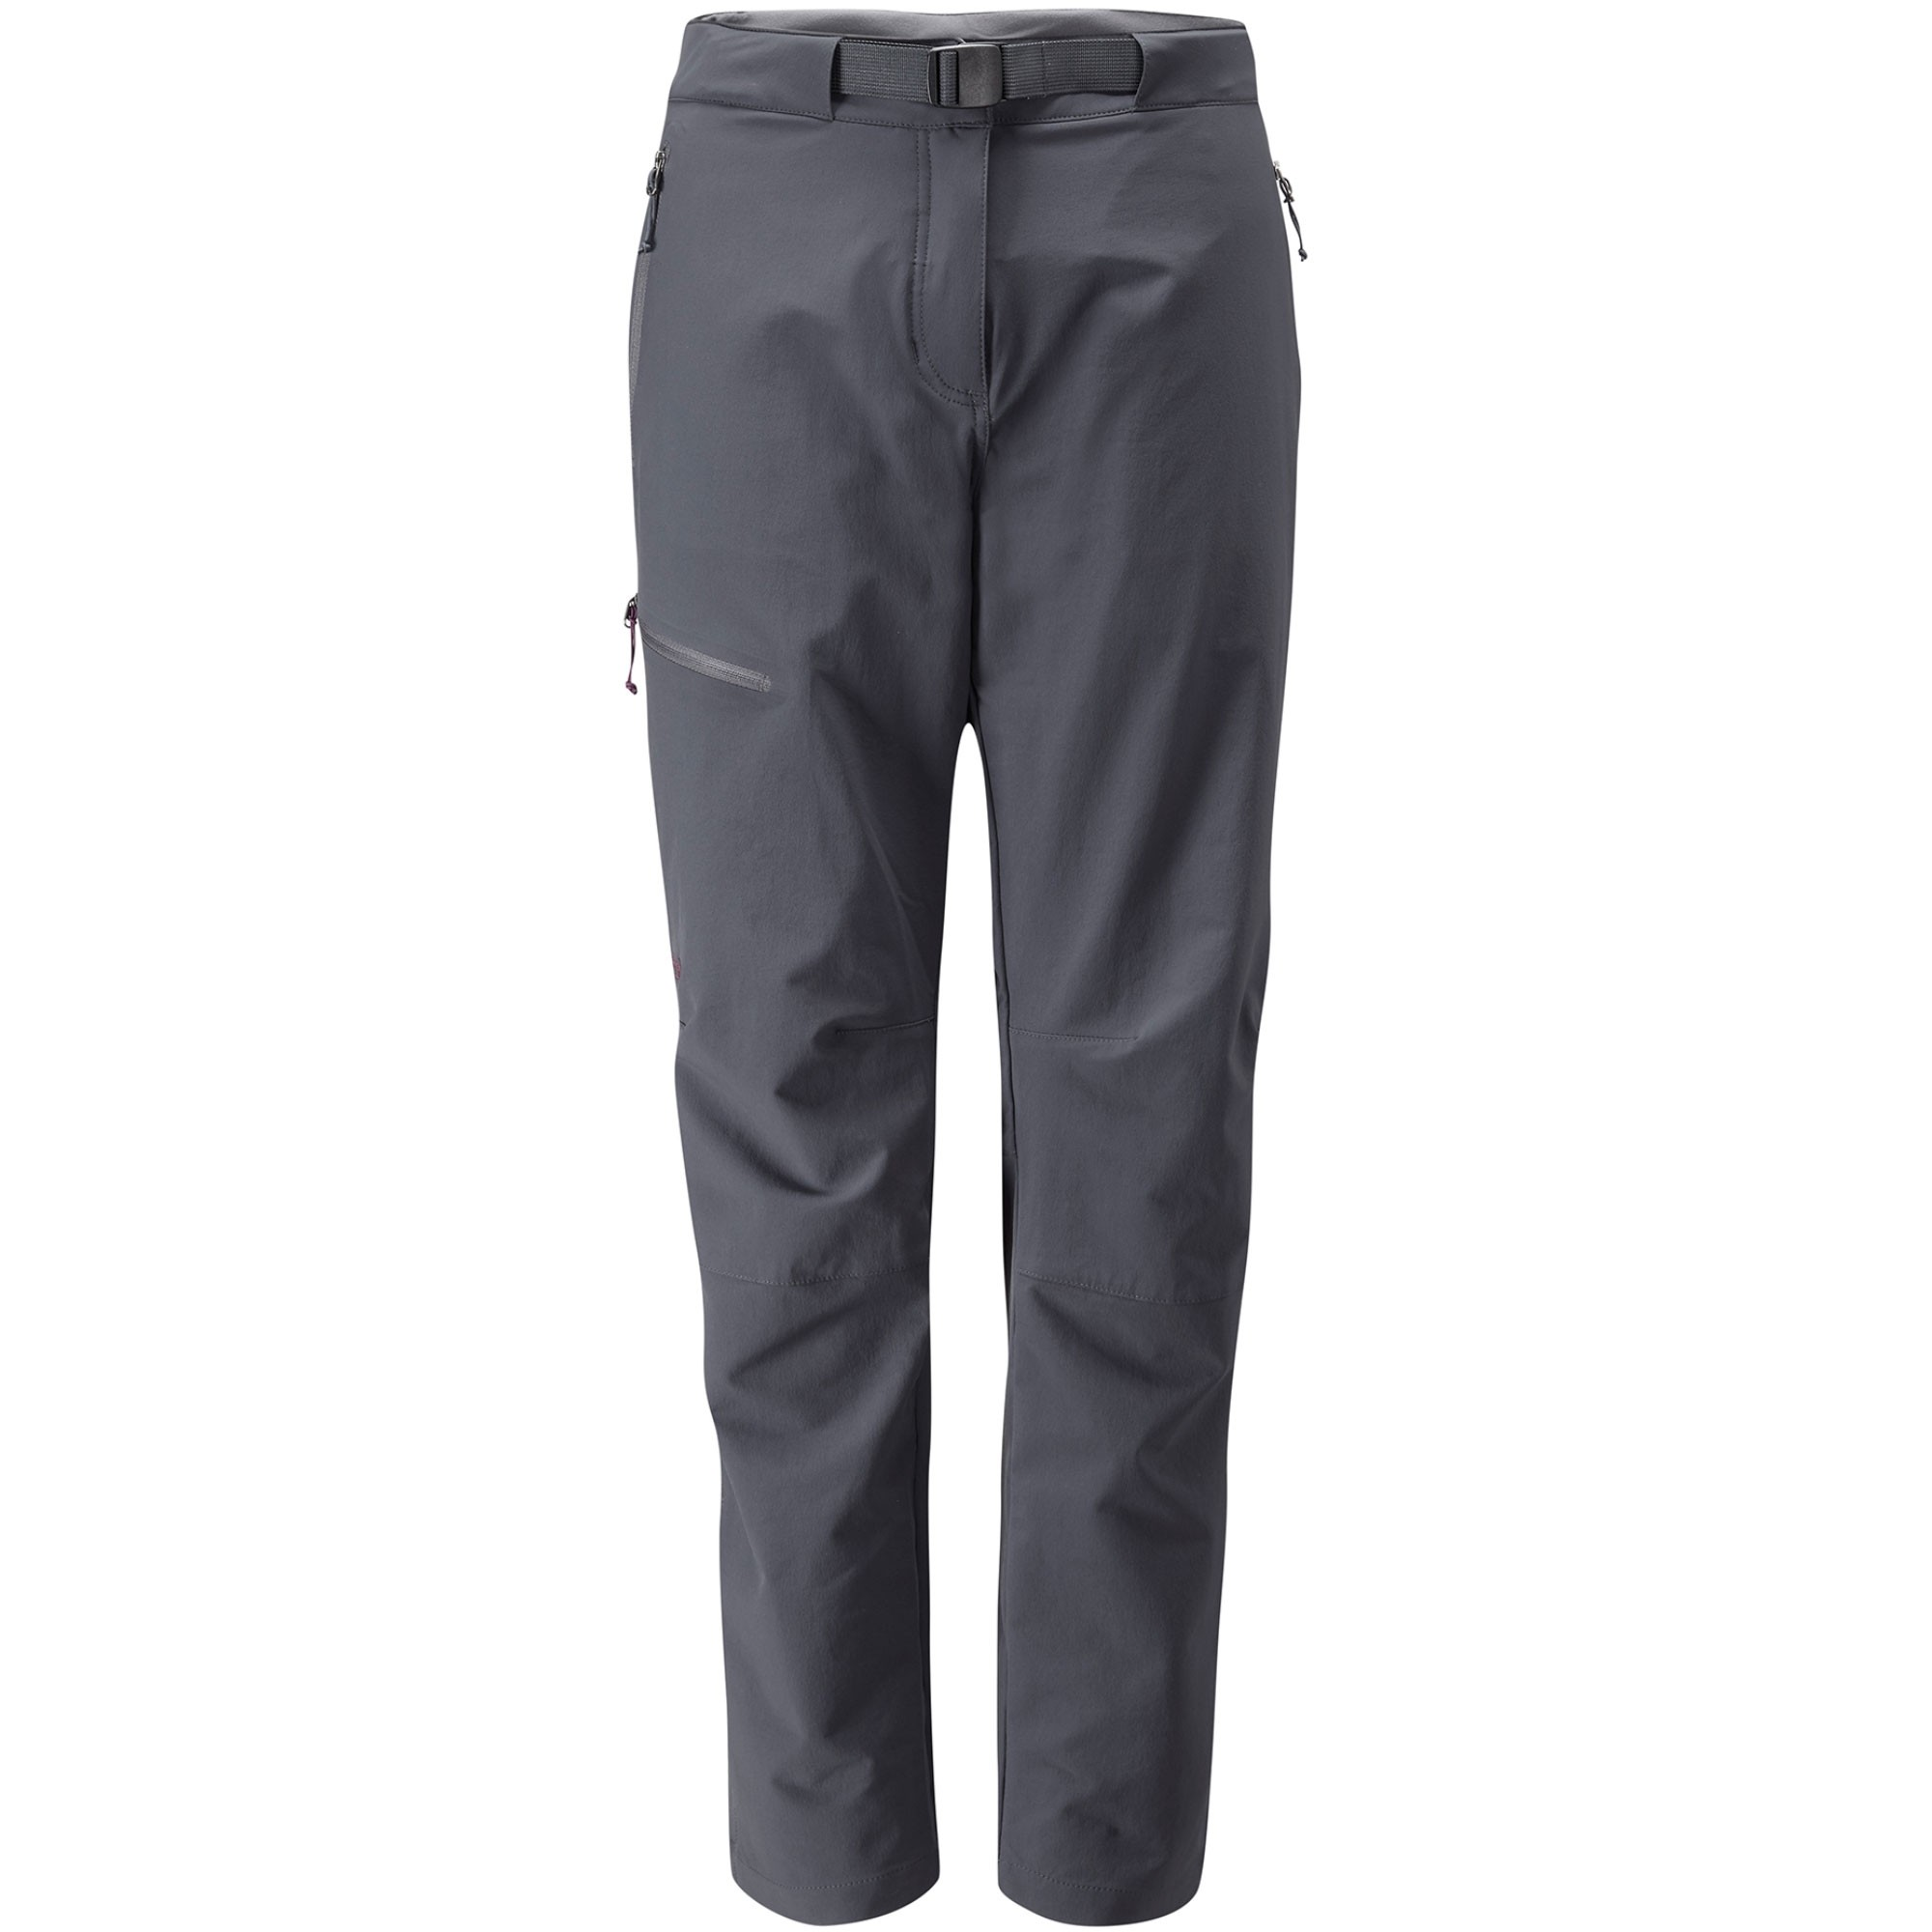 Rab-womens-vector-pants-beluga-QFU-02-BE-W17